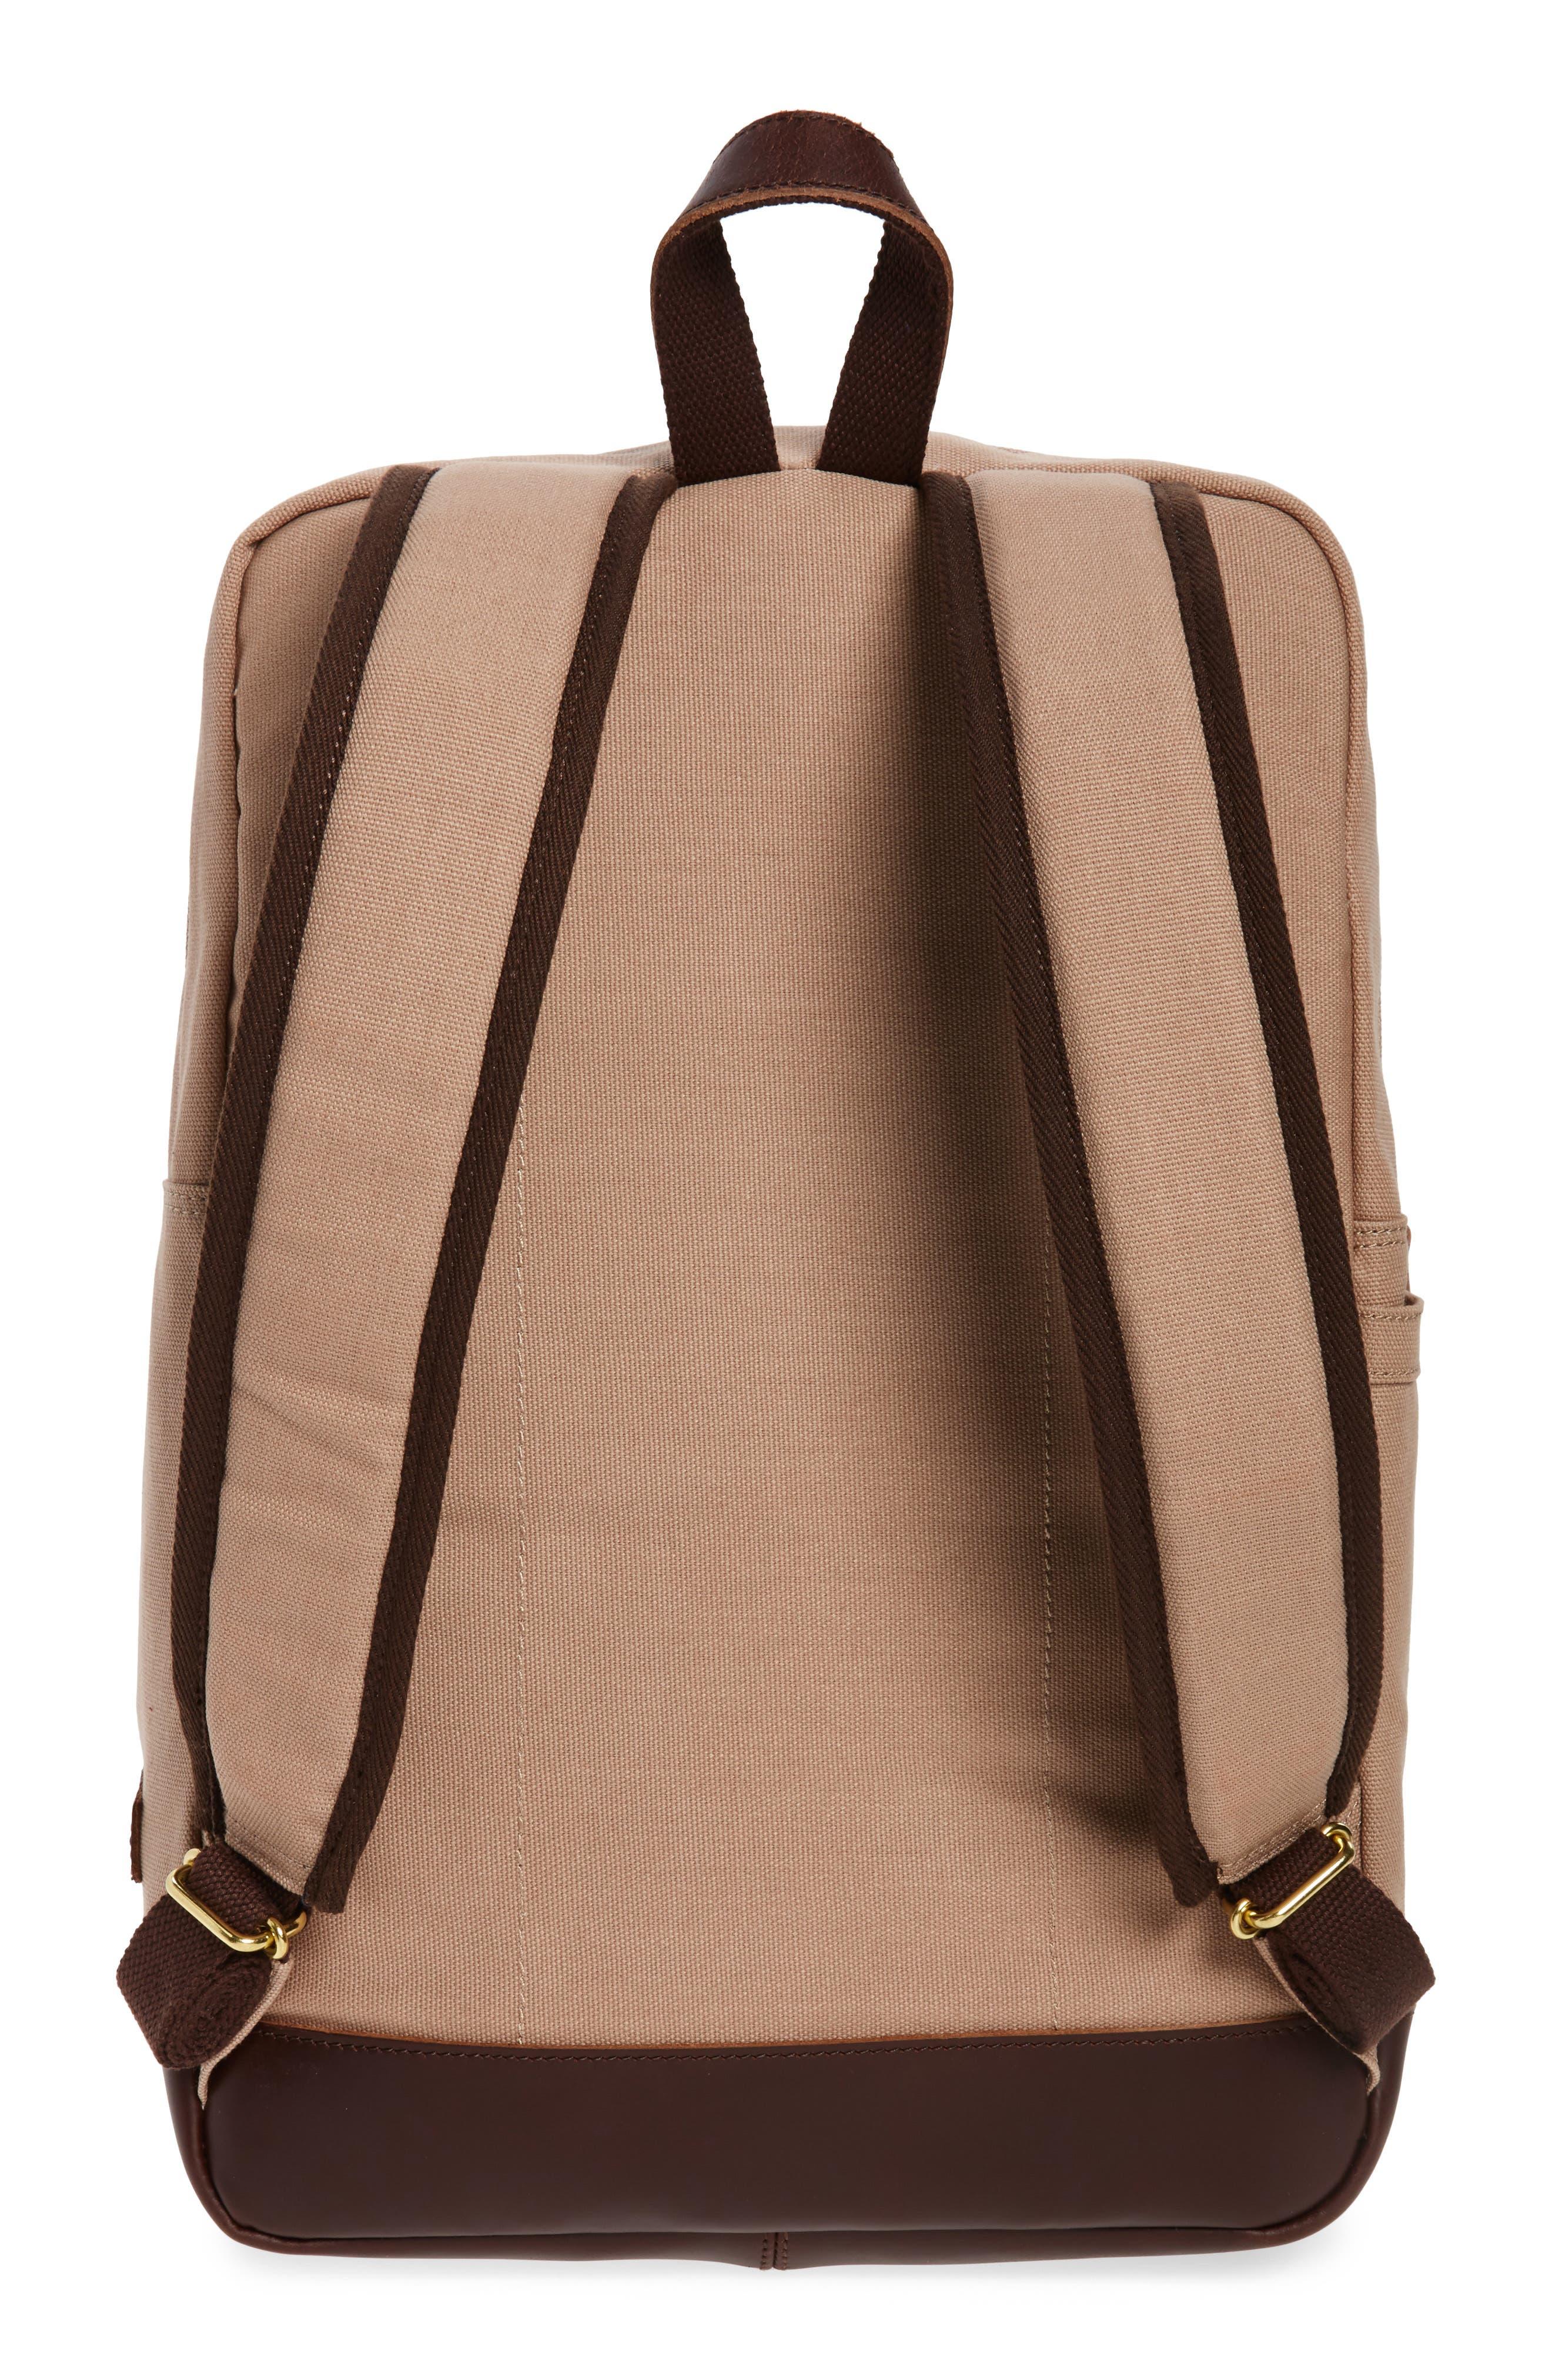 Hudderton Backpack,                             Alternate thumbnail 3, color,                             250